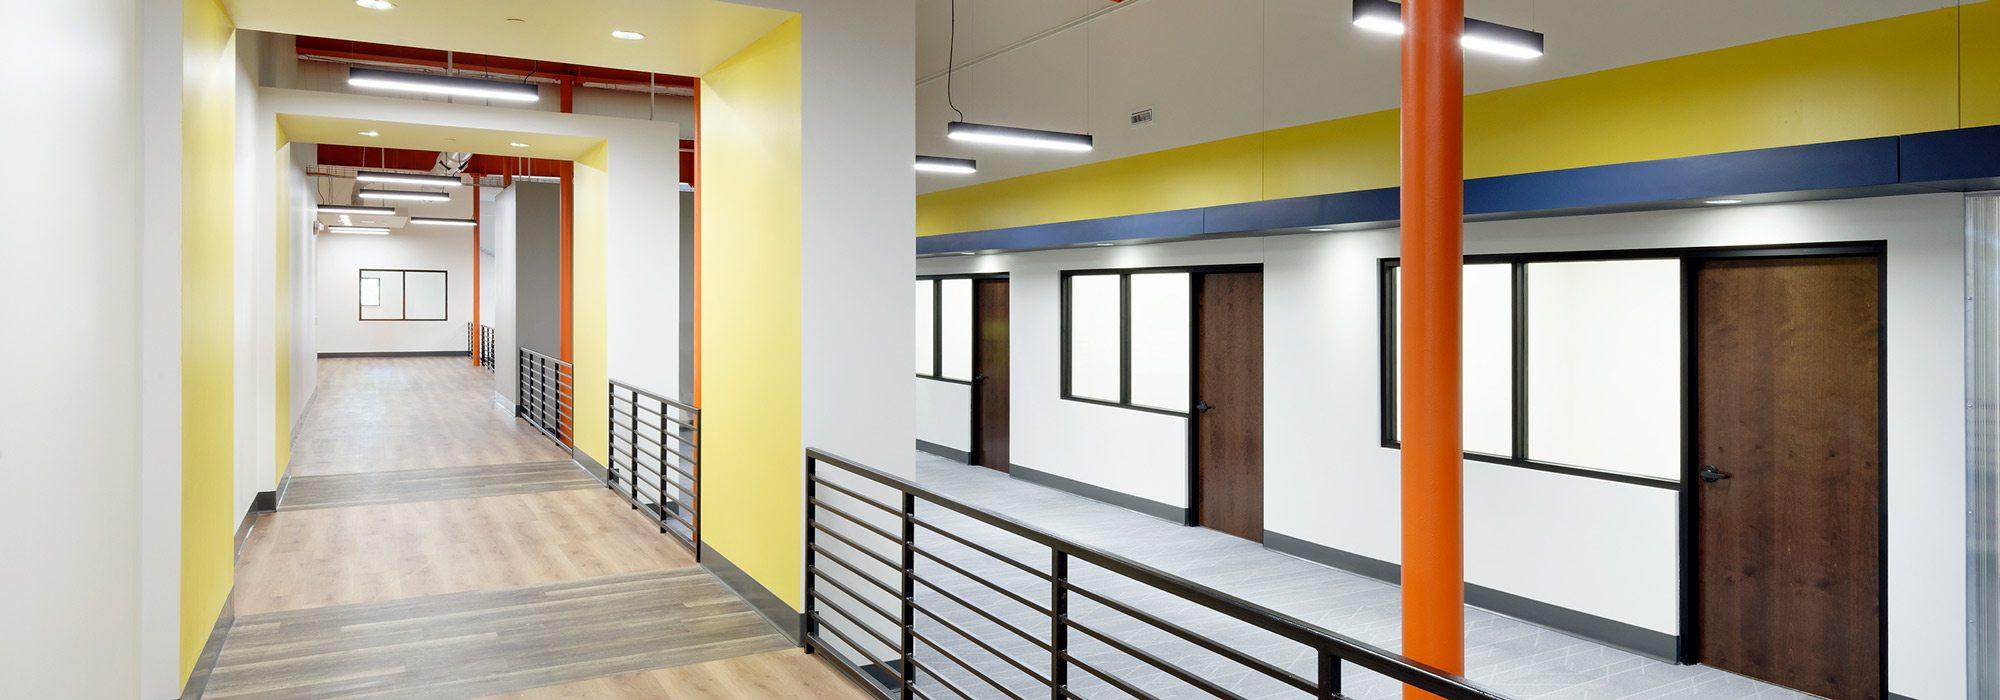 Employee Advantage interior hallway photo